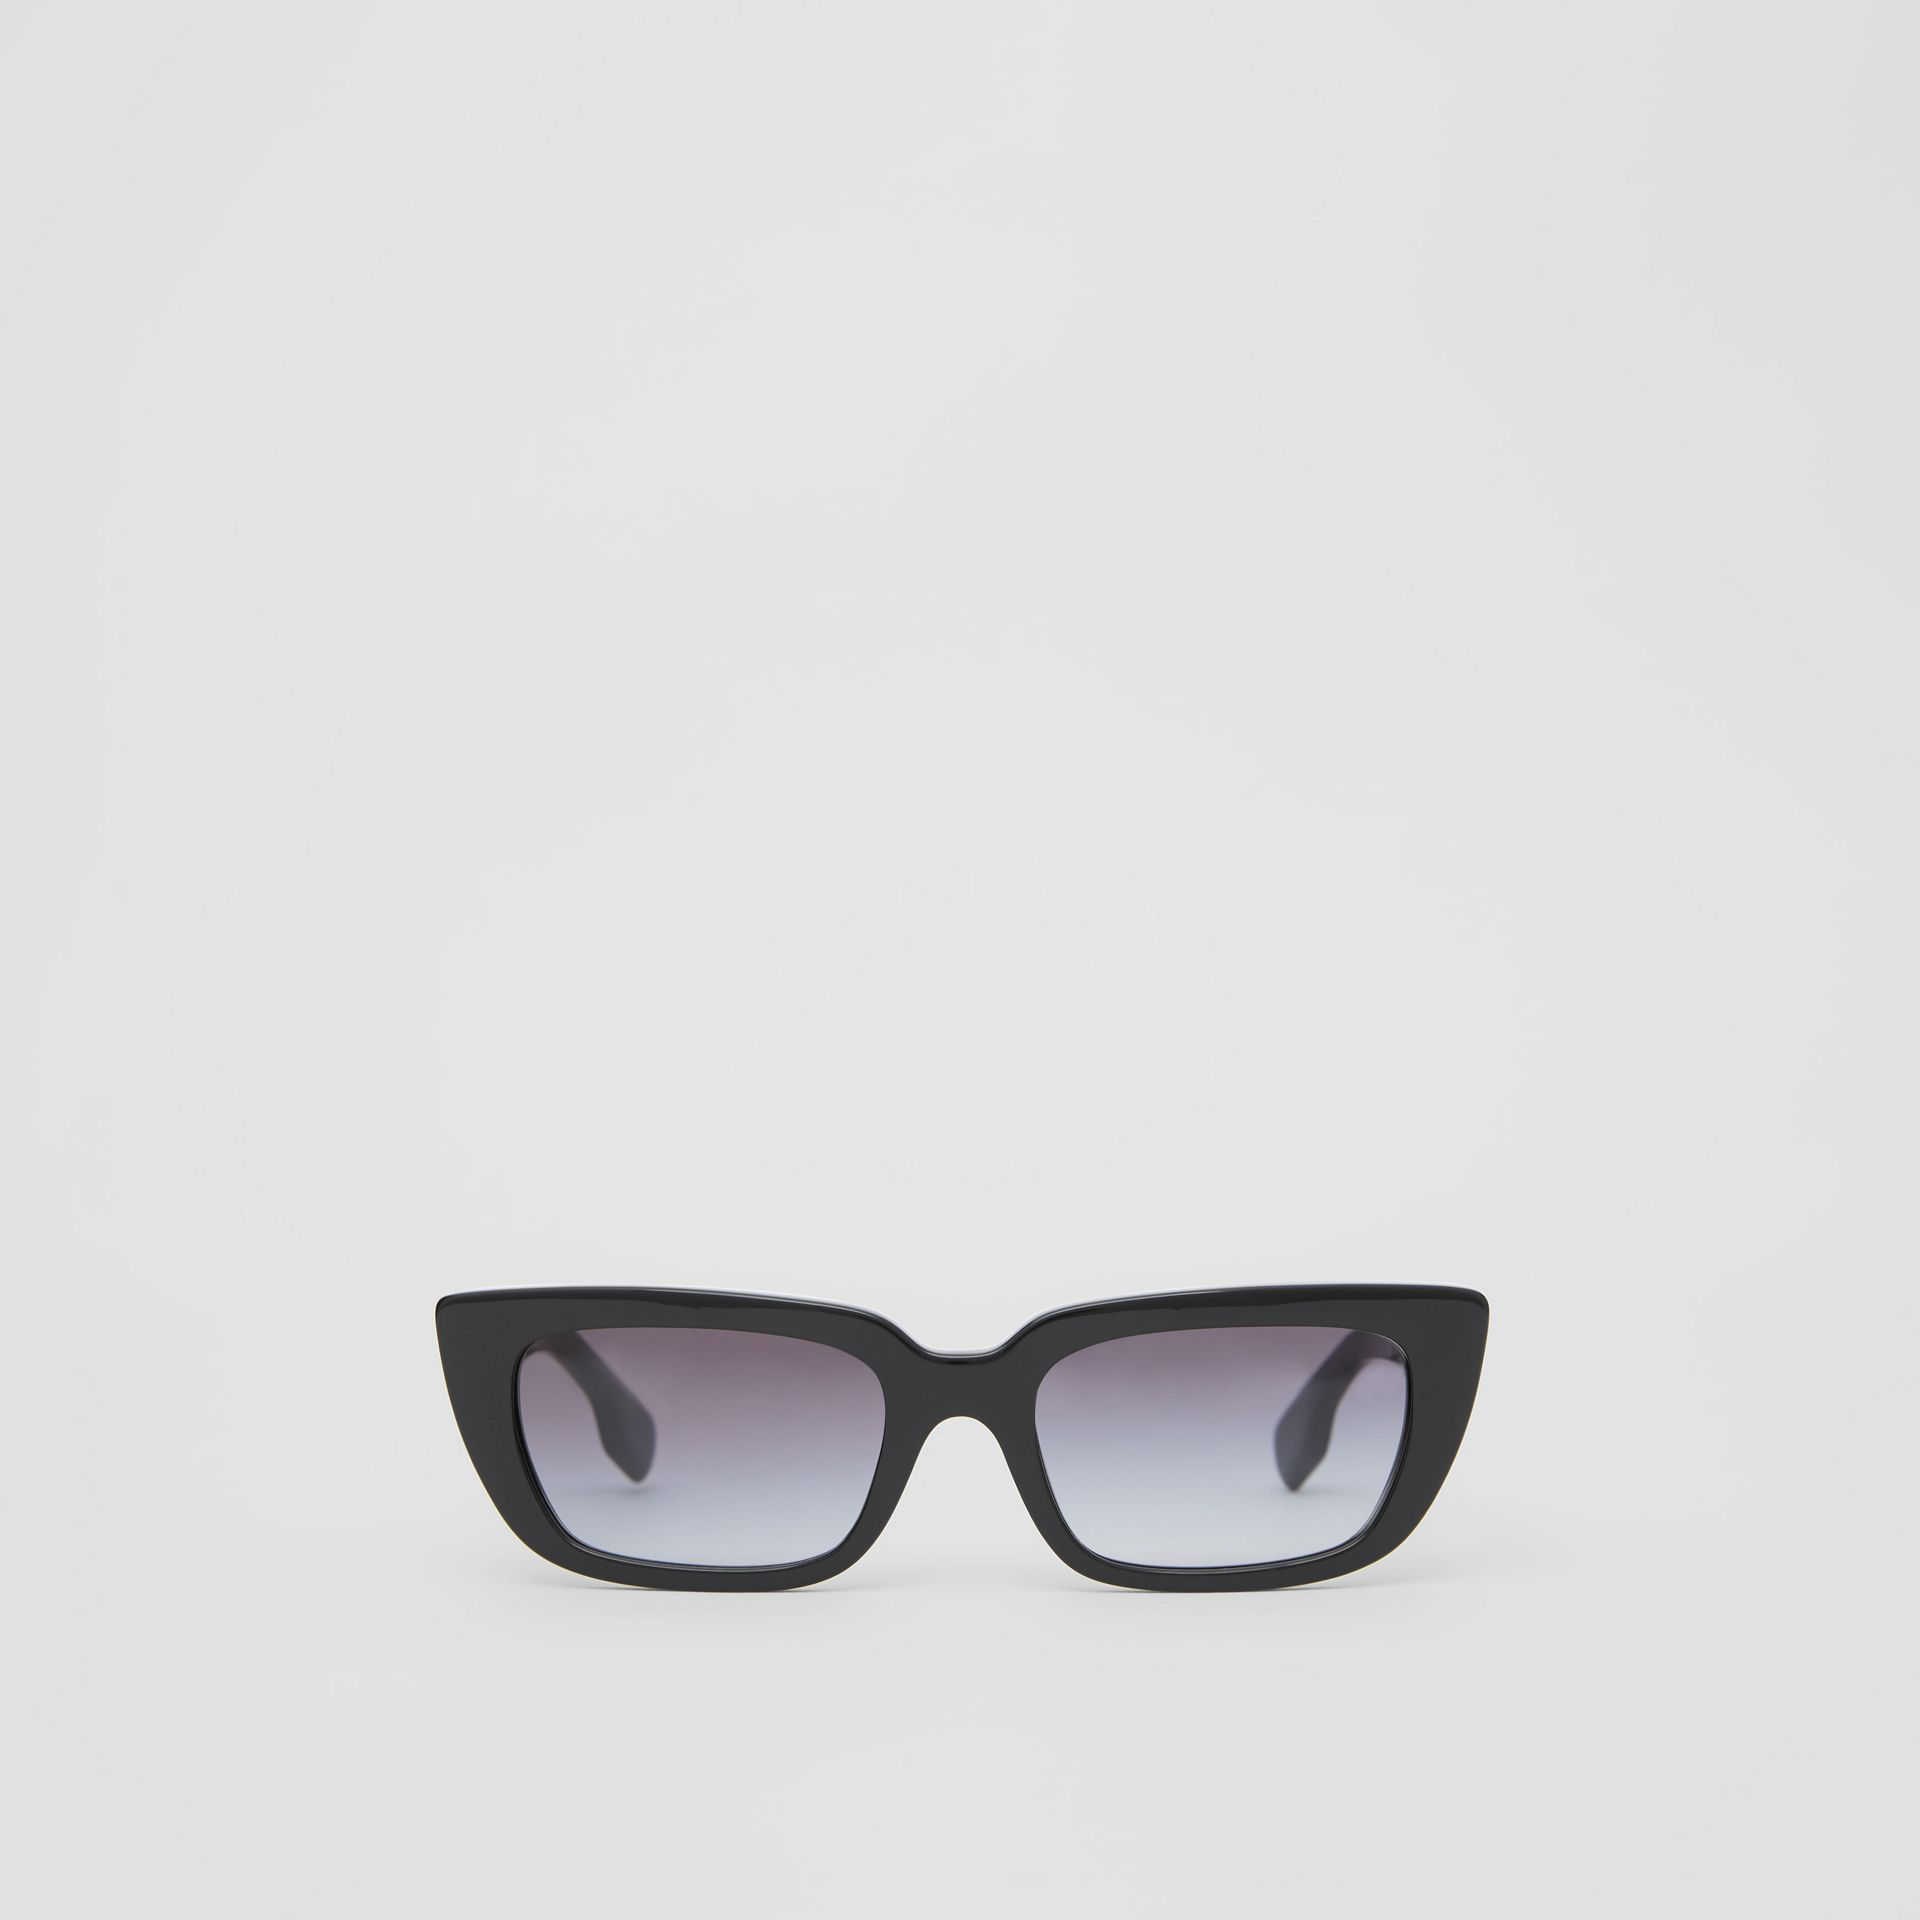 Bio-acetate Rectangular Frame Sunglasses in Black - Women | Burberry Australia - gallery image 0